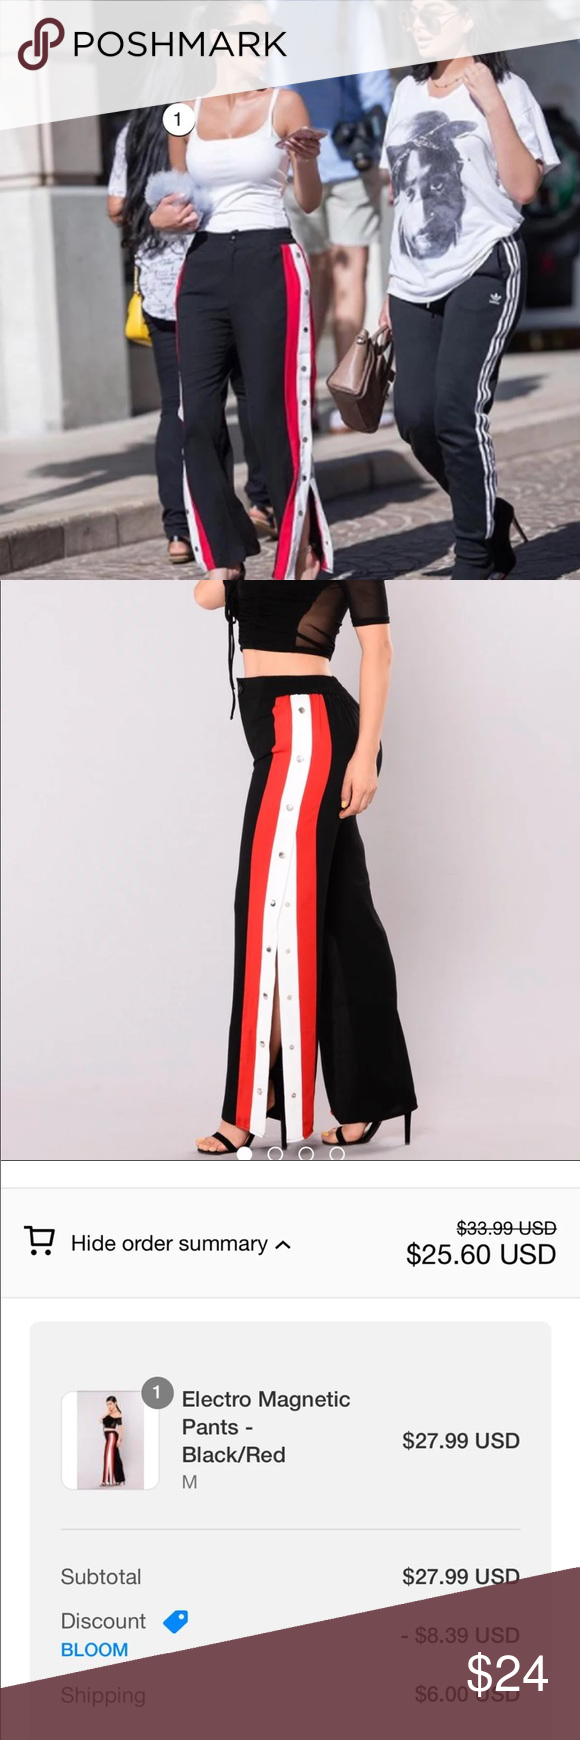 Electro Magnetic Pants Black Red Pants Black Pants Fashion Nova Pants